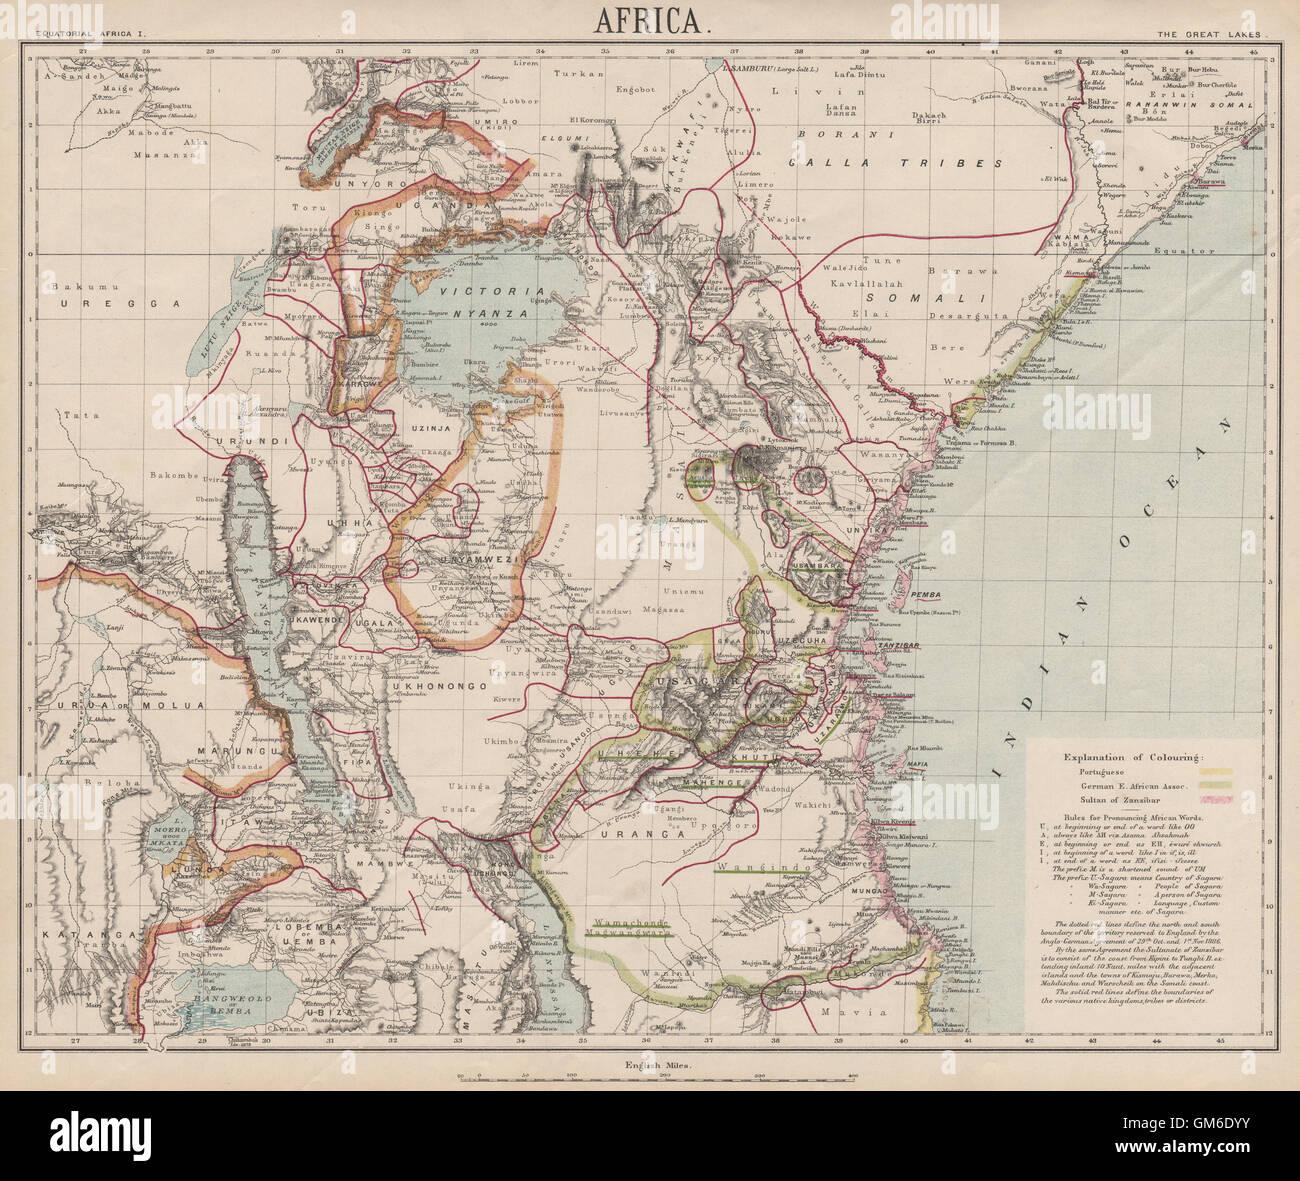 EAST AFRICAN GREAT LAKES GermanPortuguese Tanzania Zanzibar